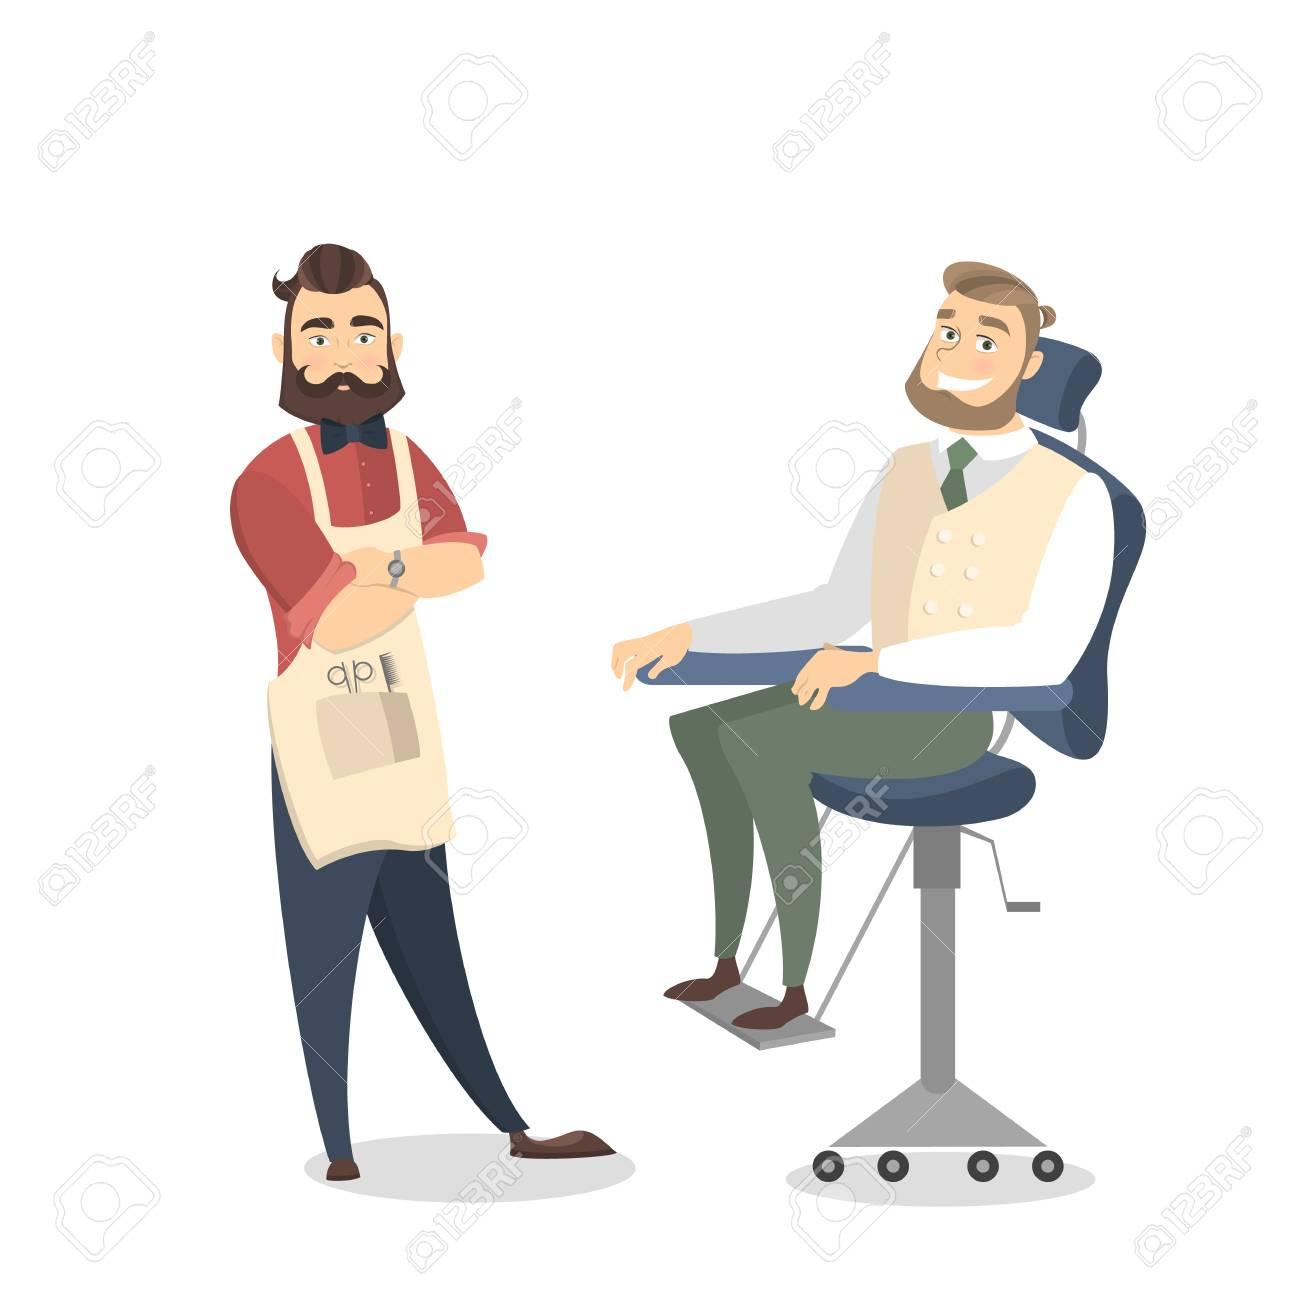 Person auf einem Stuhl sitzend Vektor Clipart Bild -vc056575-CoolCLIPS.com